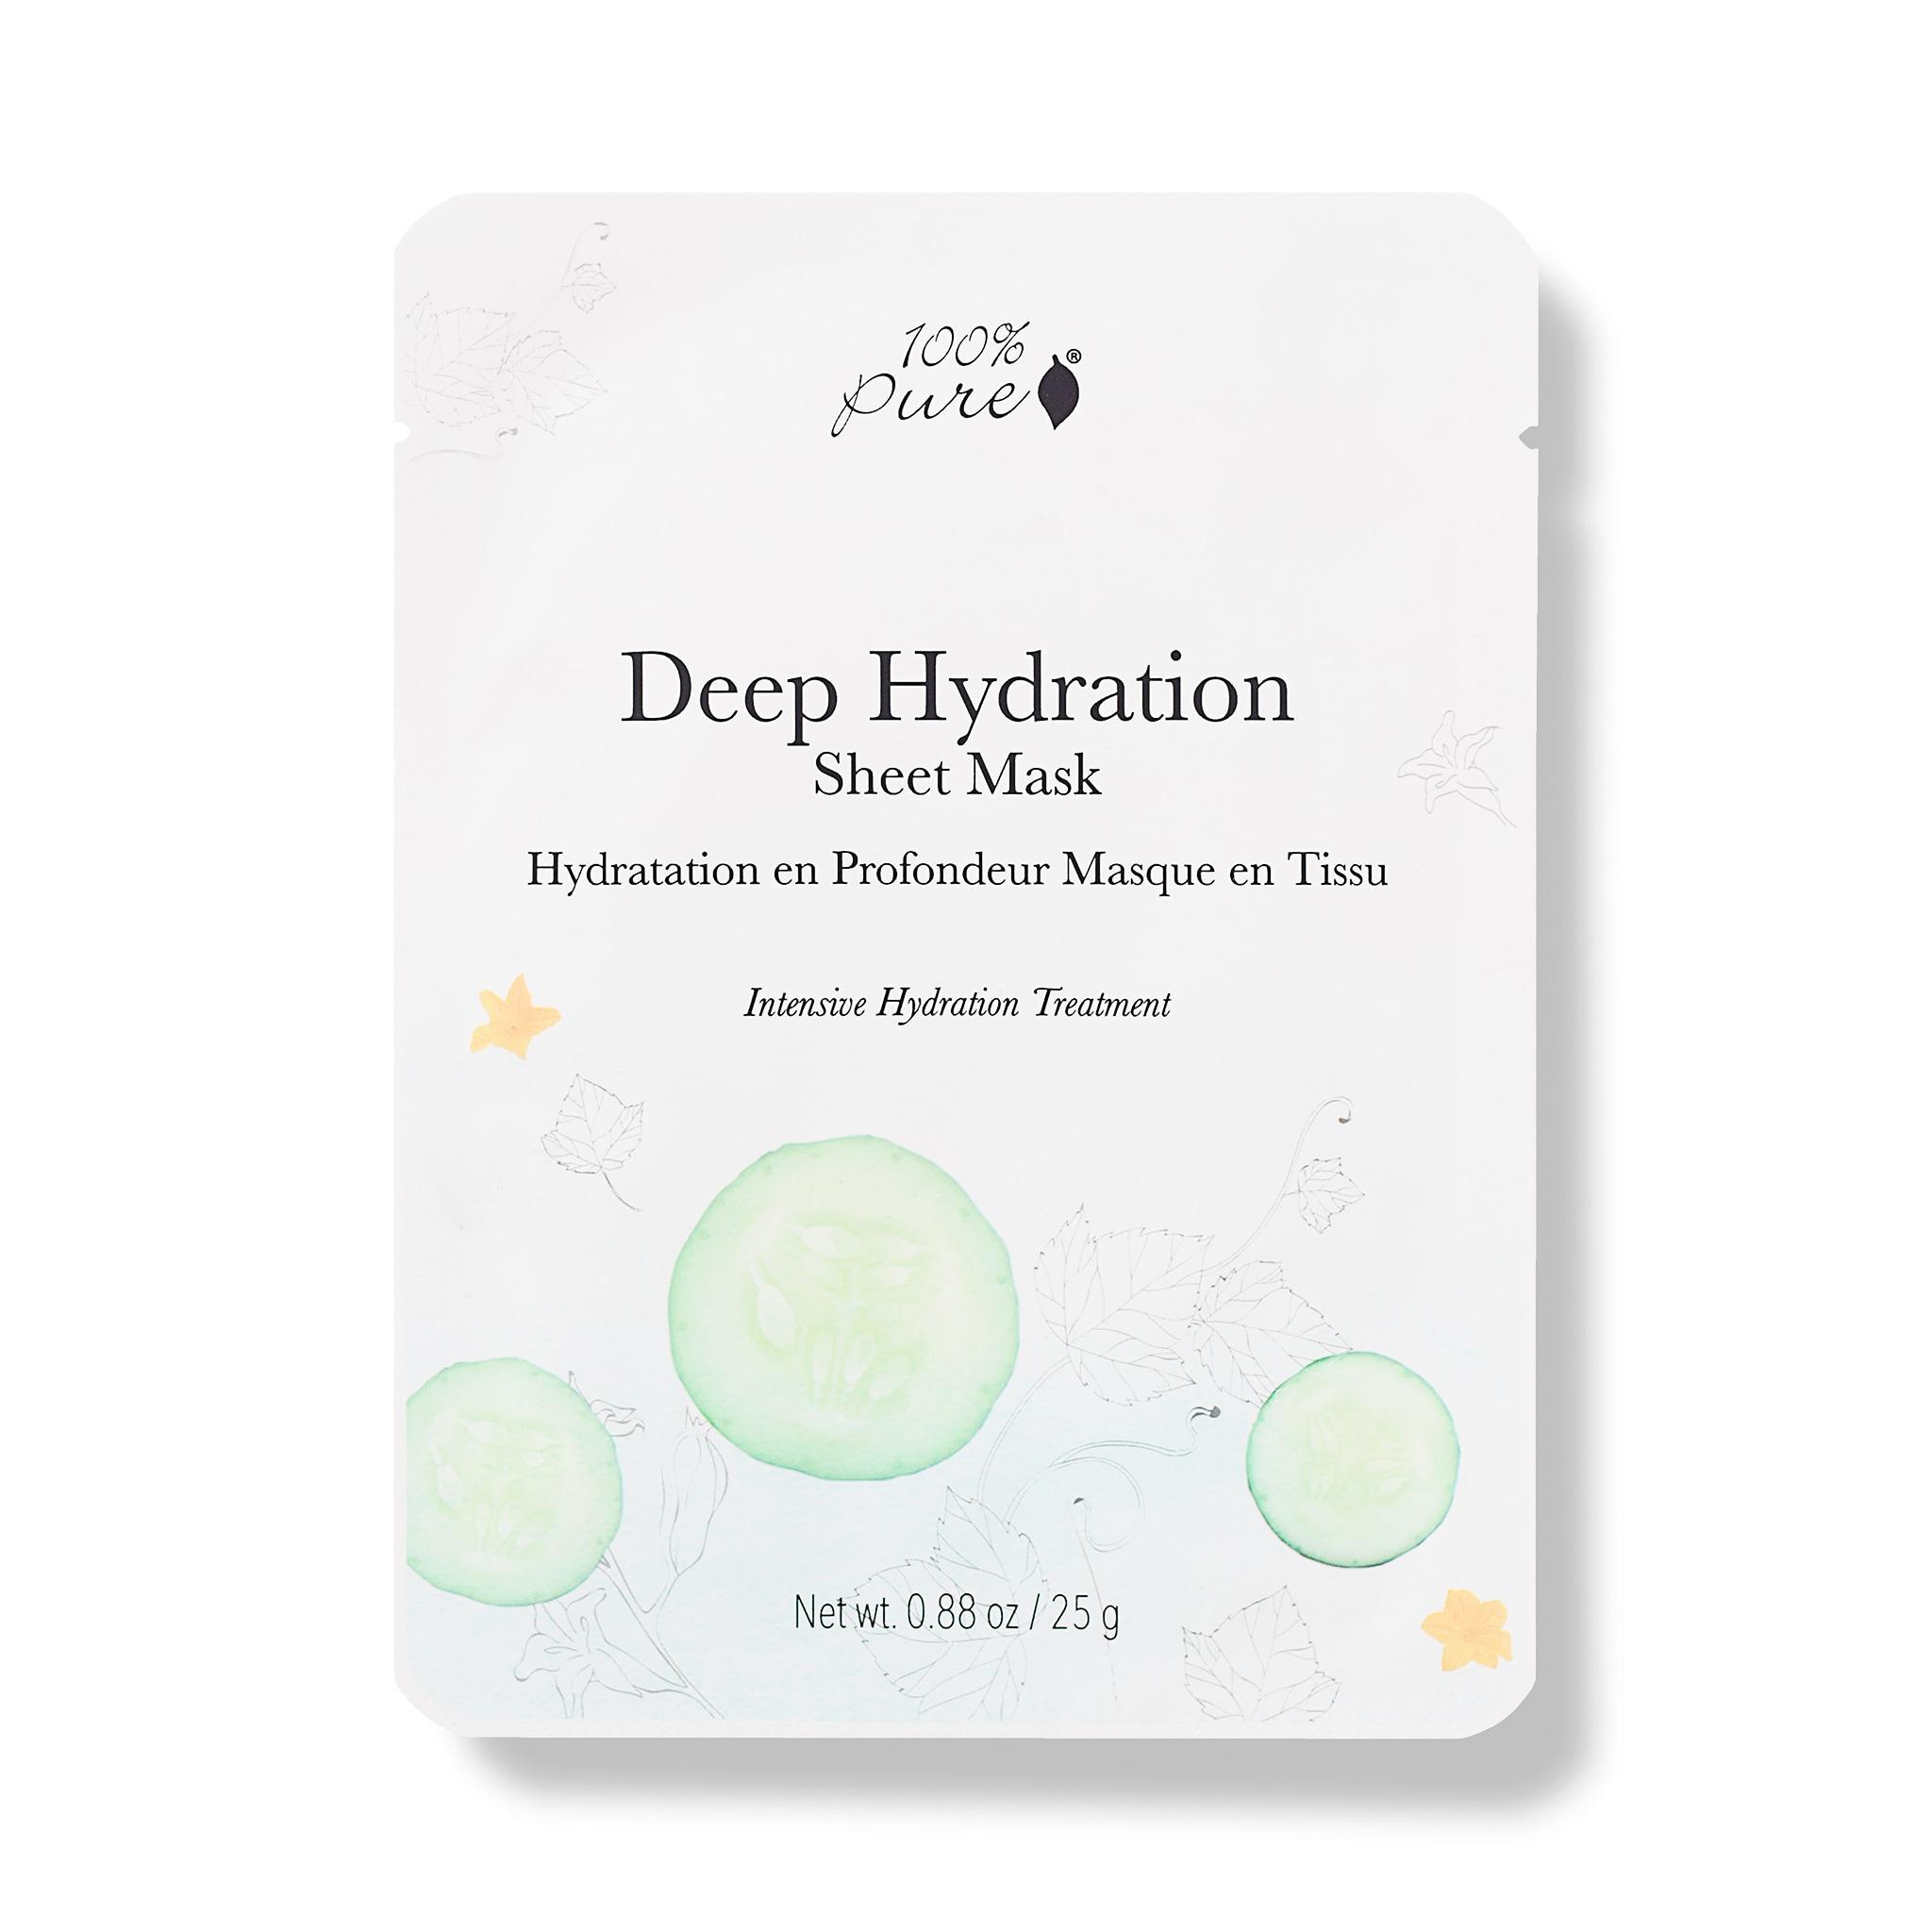 Product Grid - Deep Hydration Sheet Mask